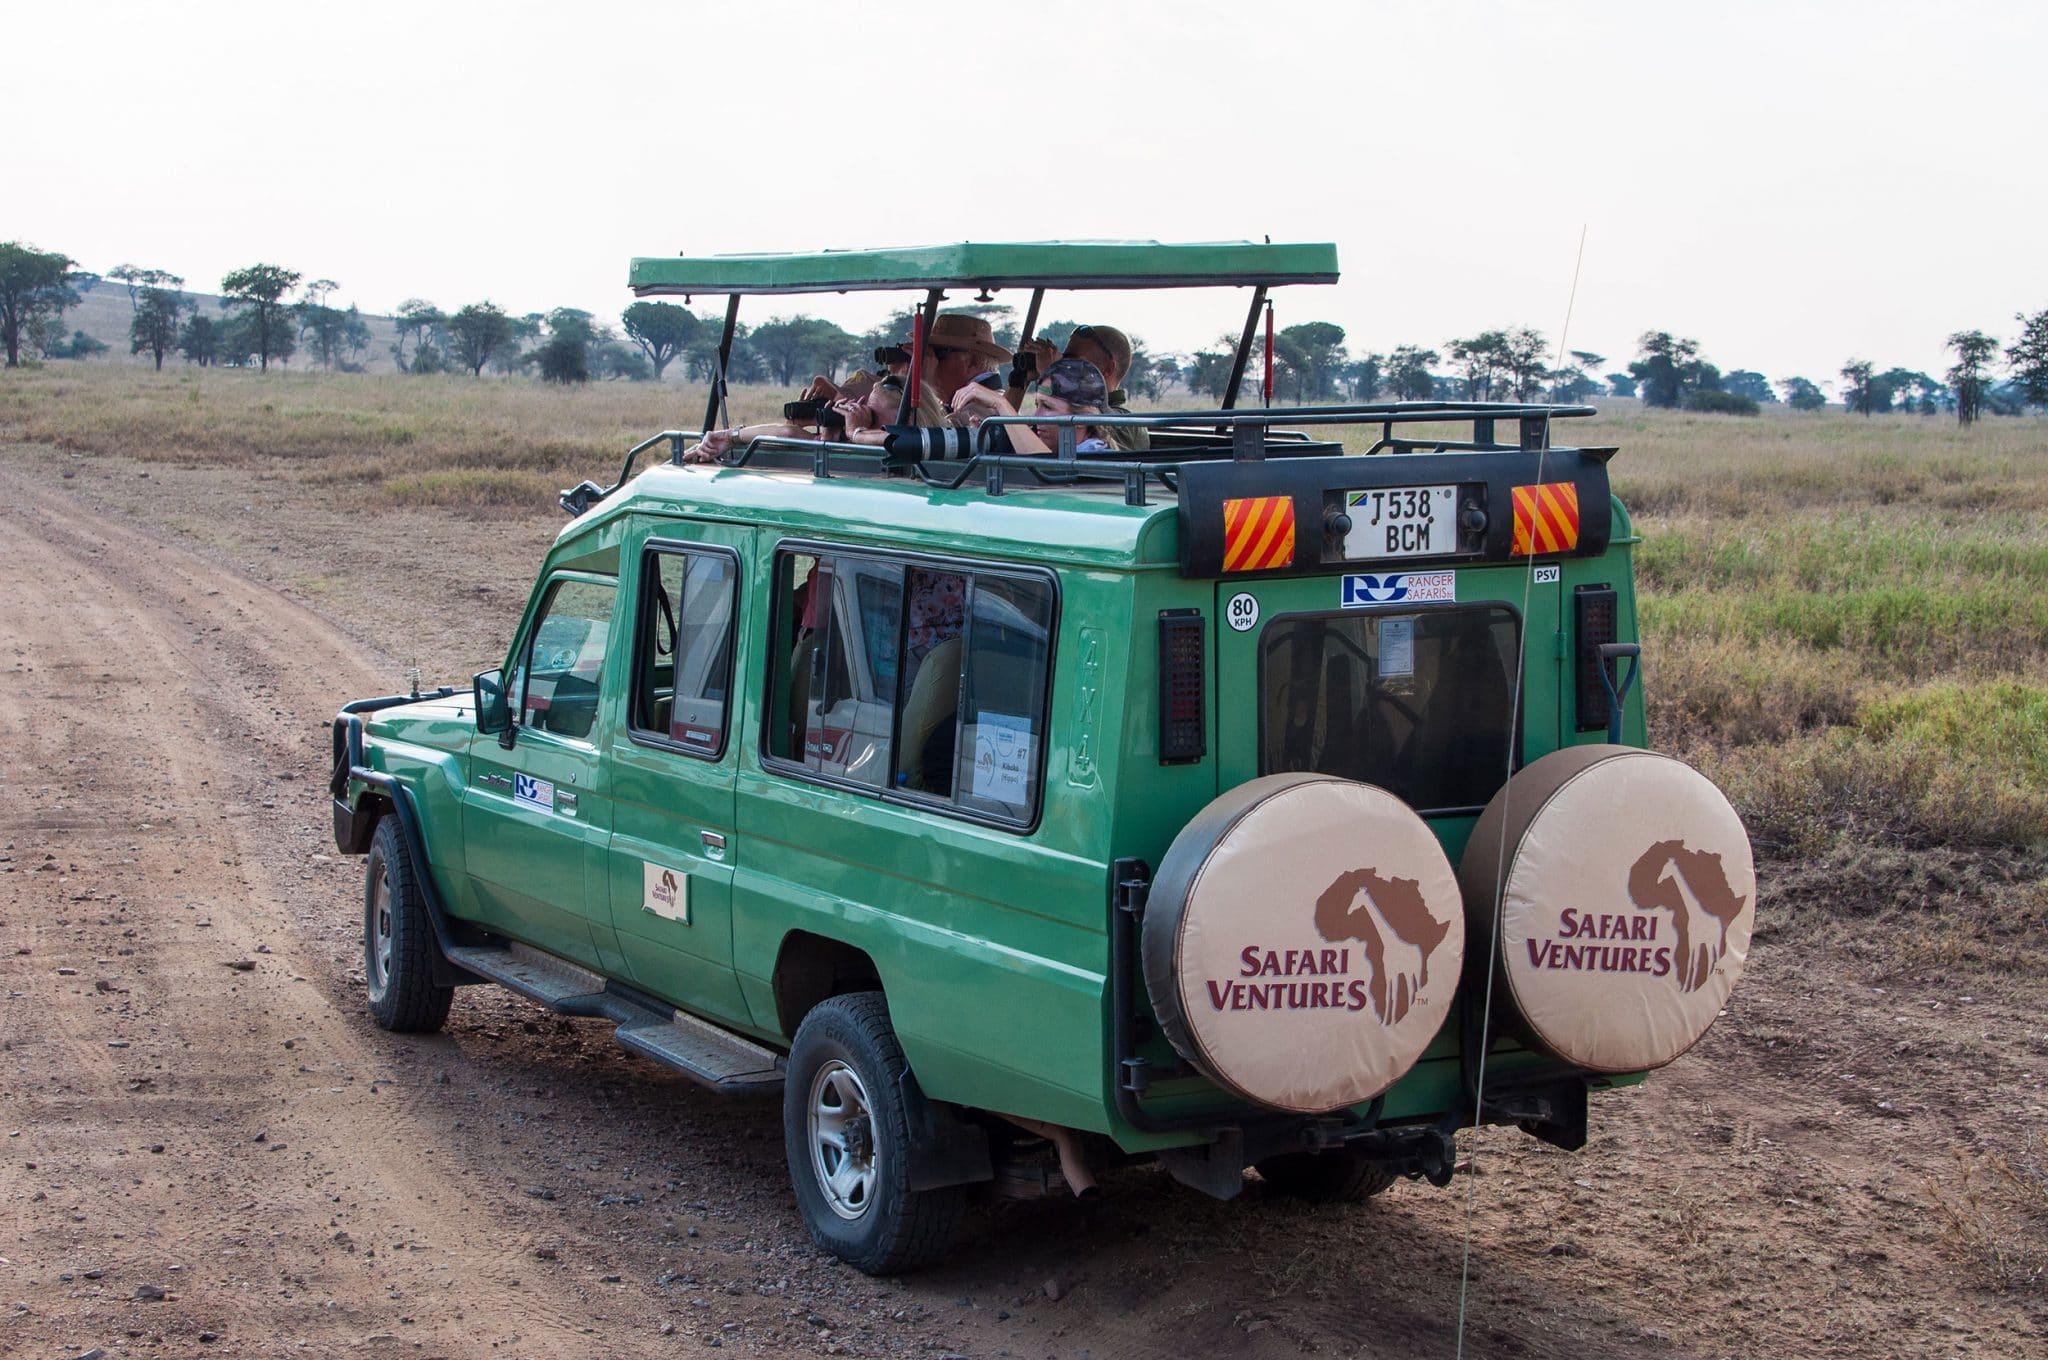 Eastern Africa Vehicle